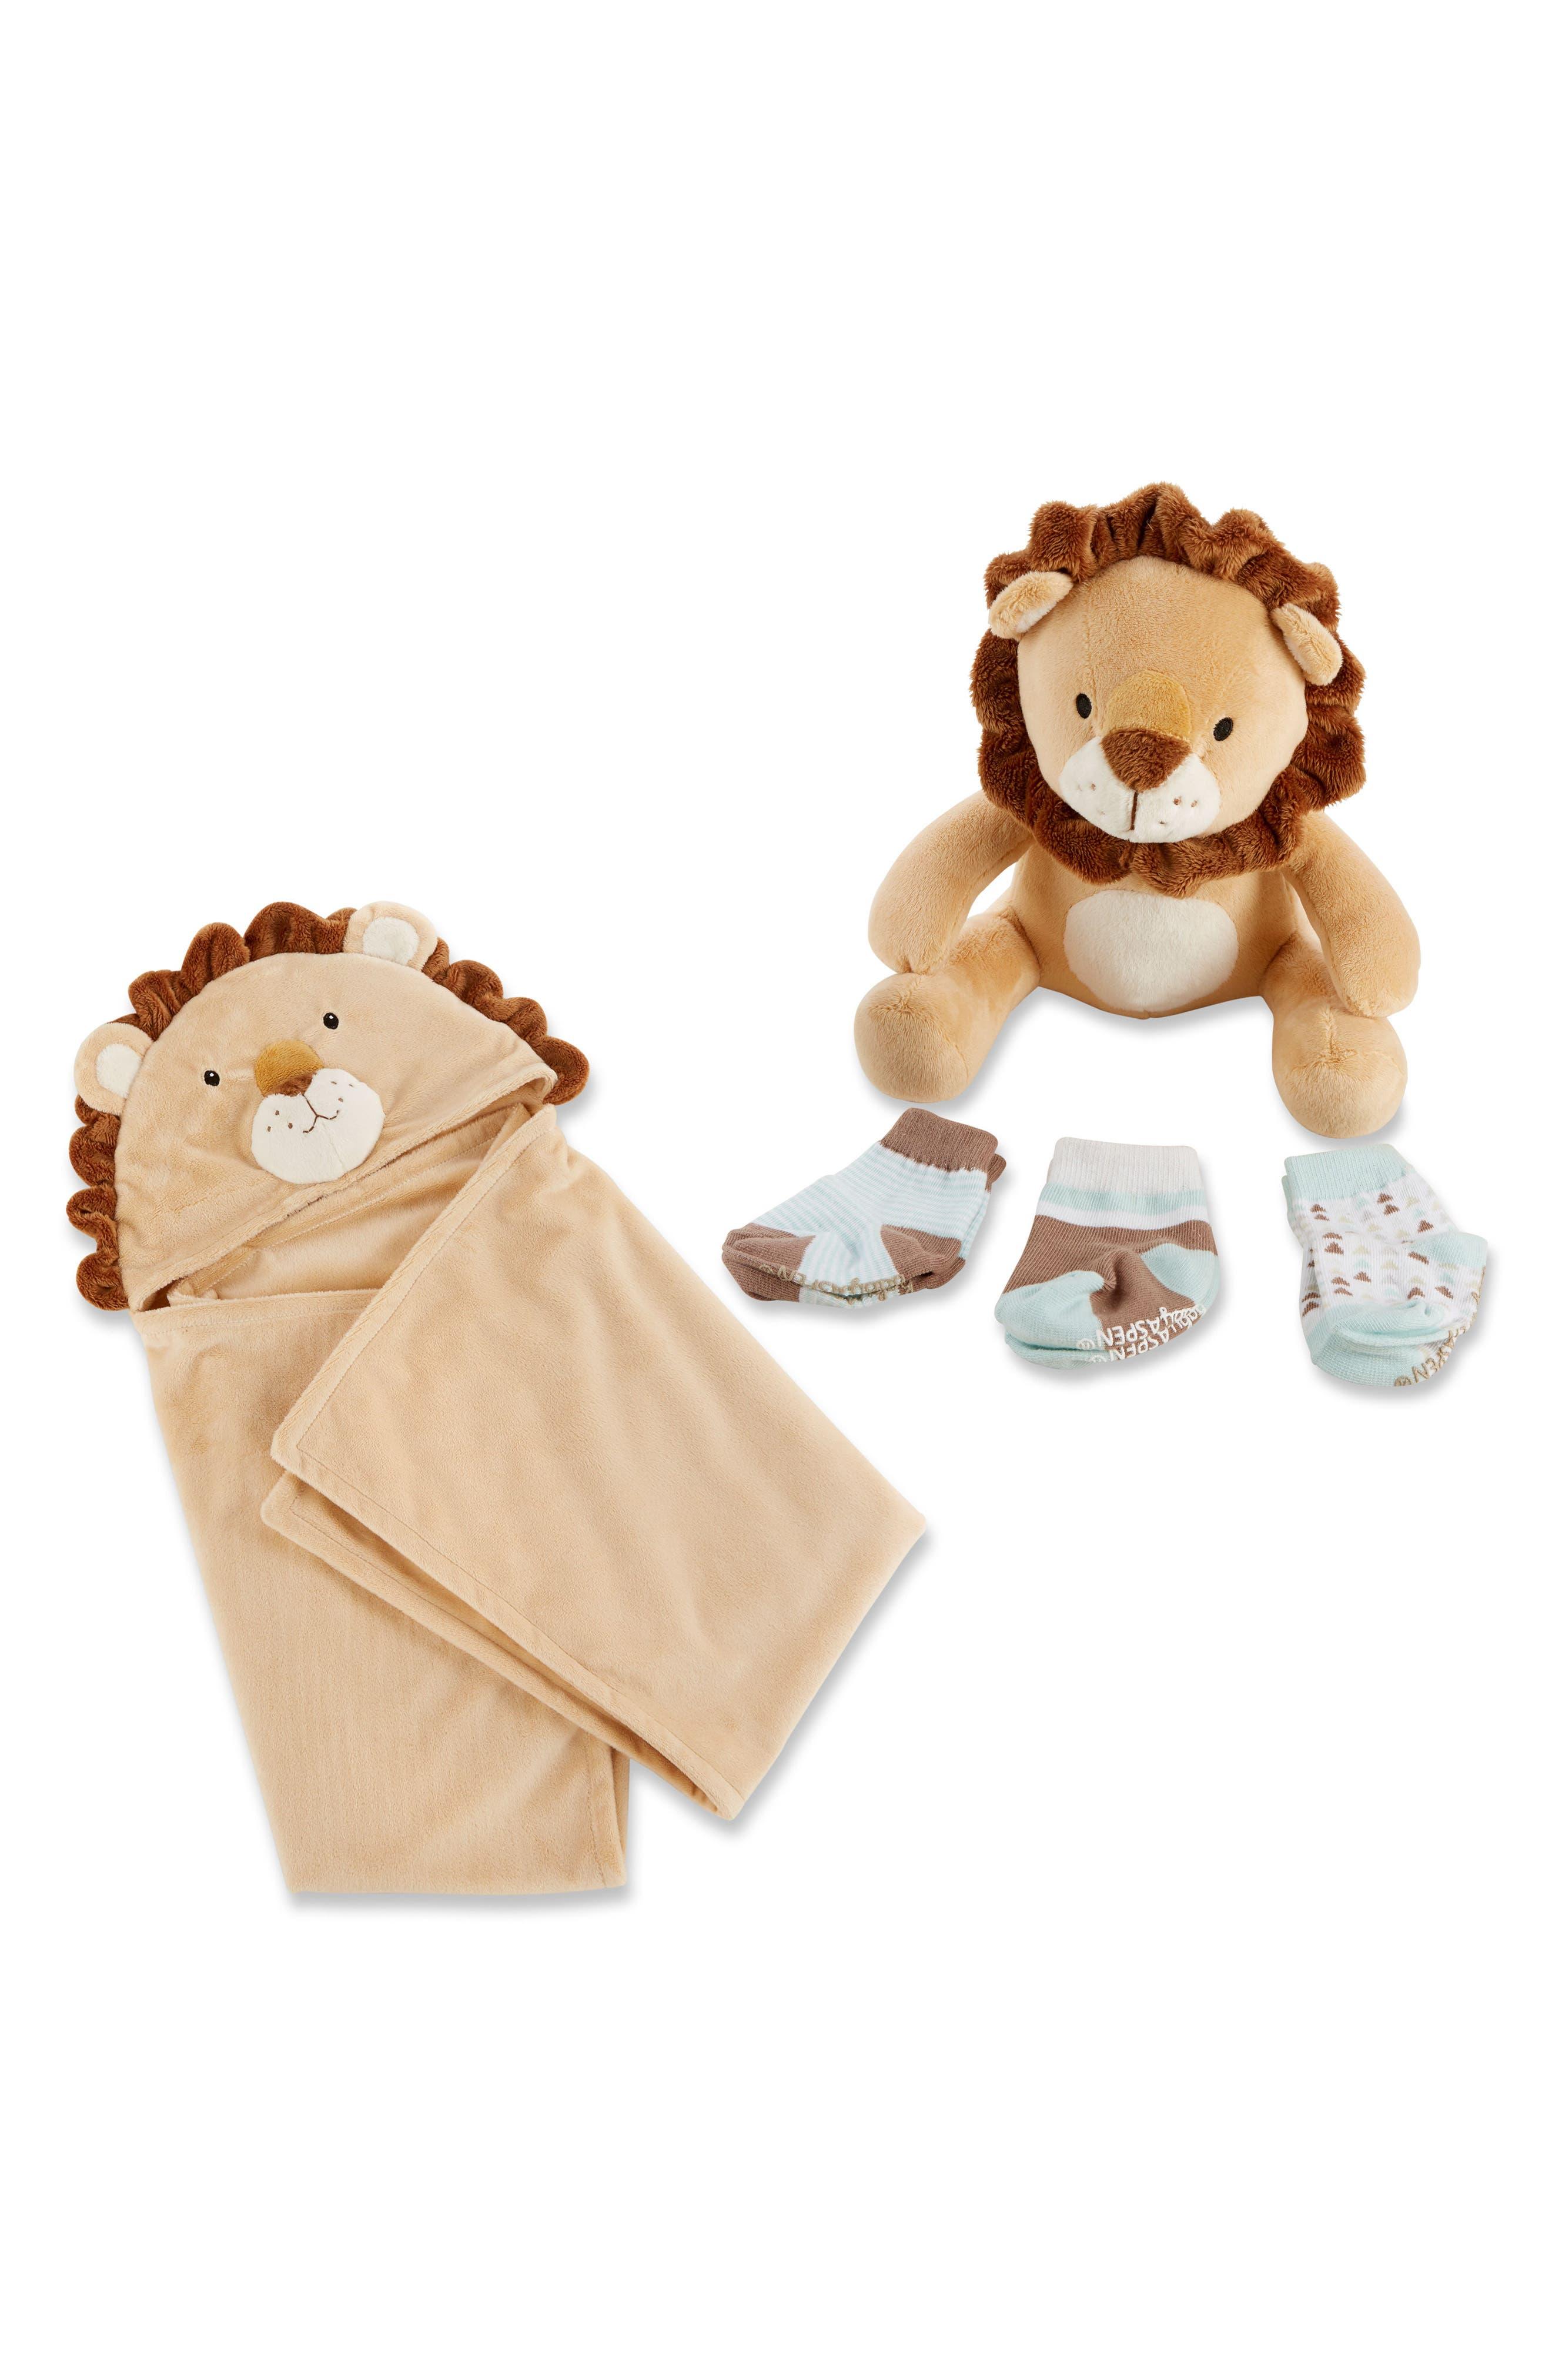 Lion Safari Hooded Blanket, 3-Pack Socks & Stuffed Animal Set,                         Main,                         color, Brown